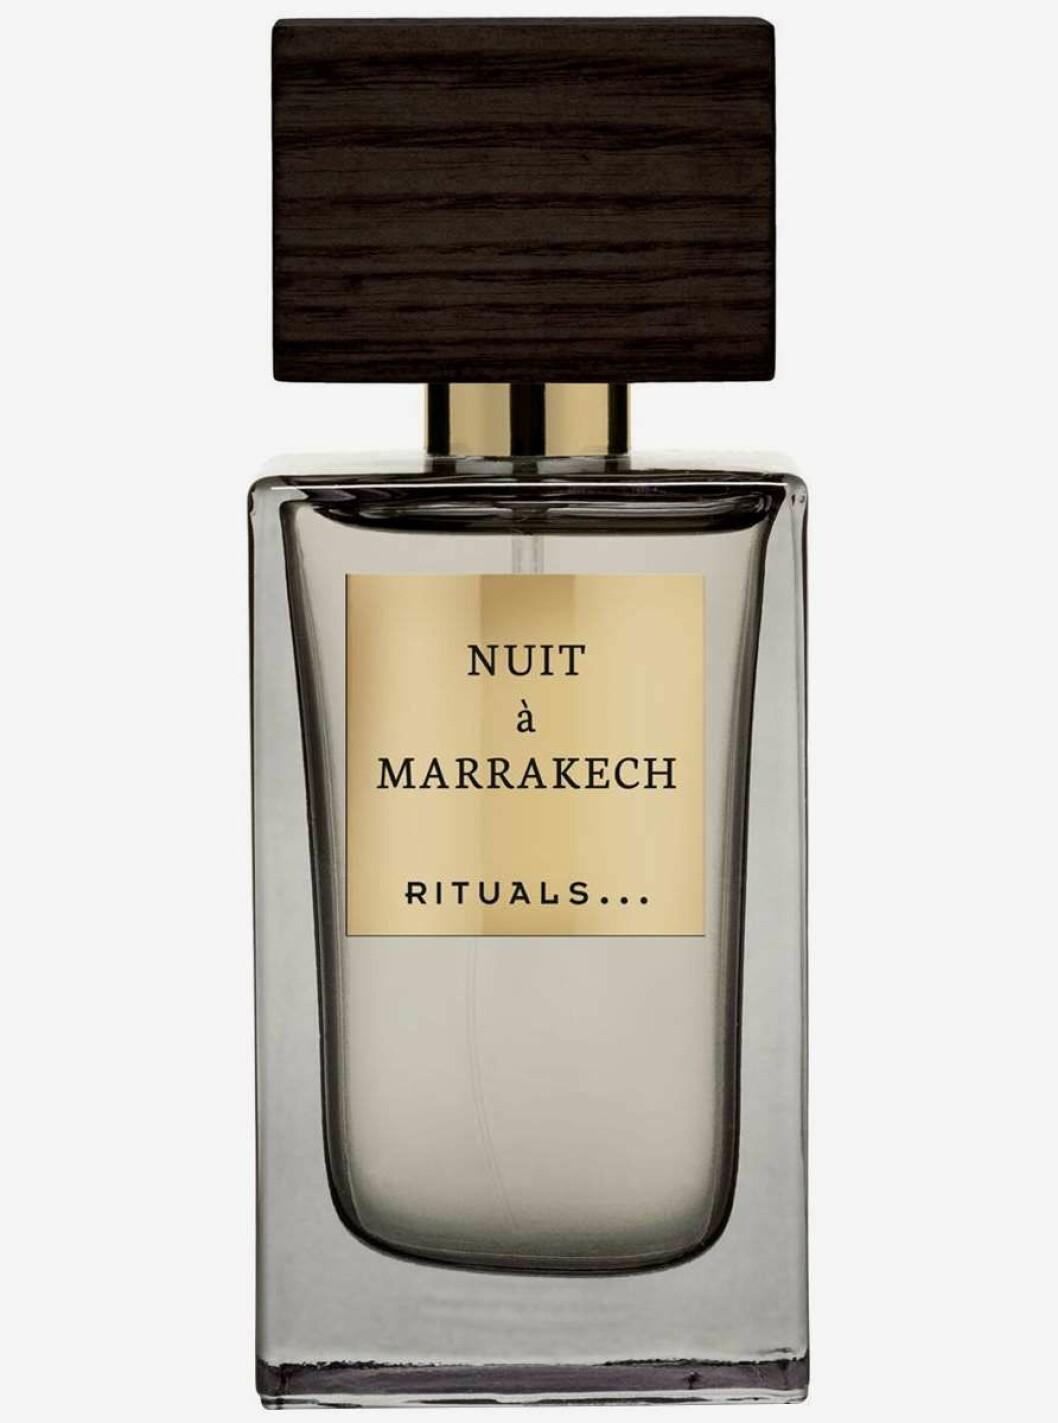 Rituals parfym Nuit á Marrakech.